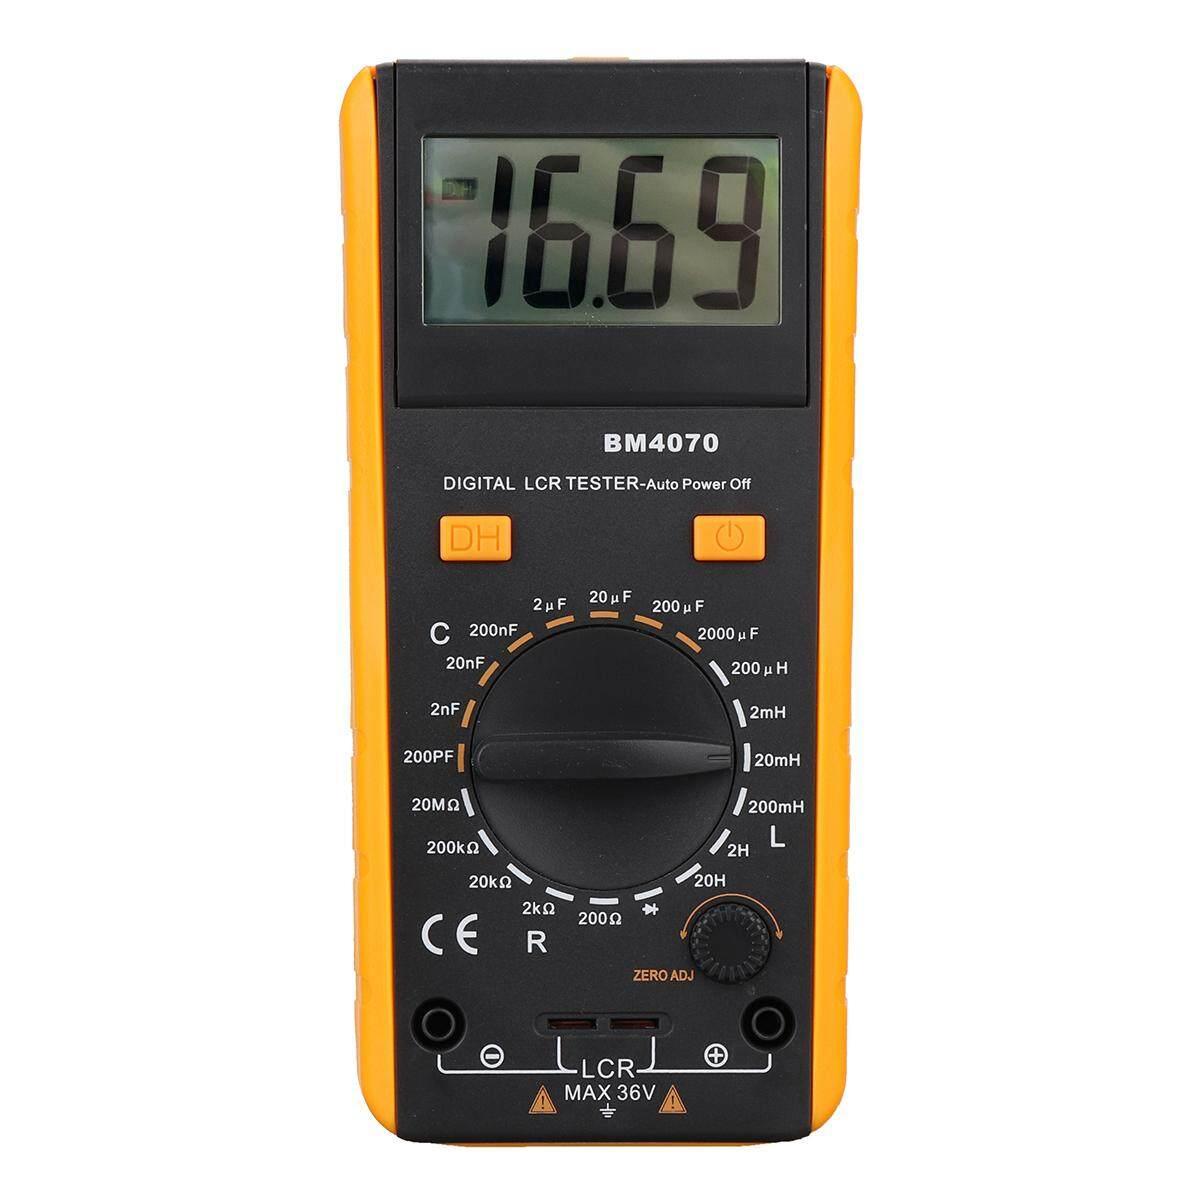 Szbj Bm4070 Lcr Meter Inductance Capacitance Resistance Tester Ed By Glimmer.